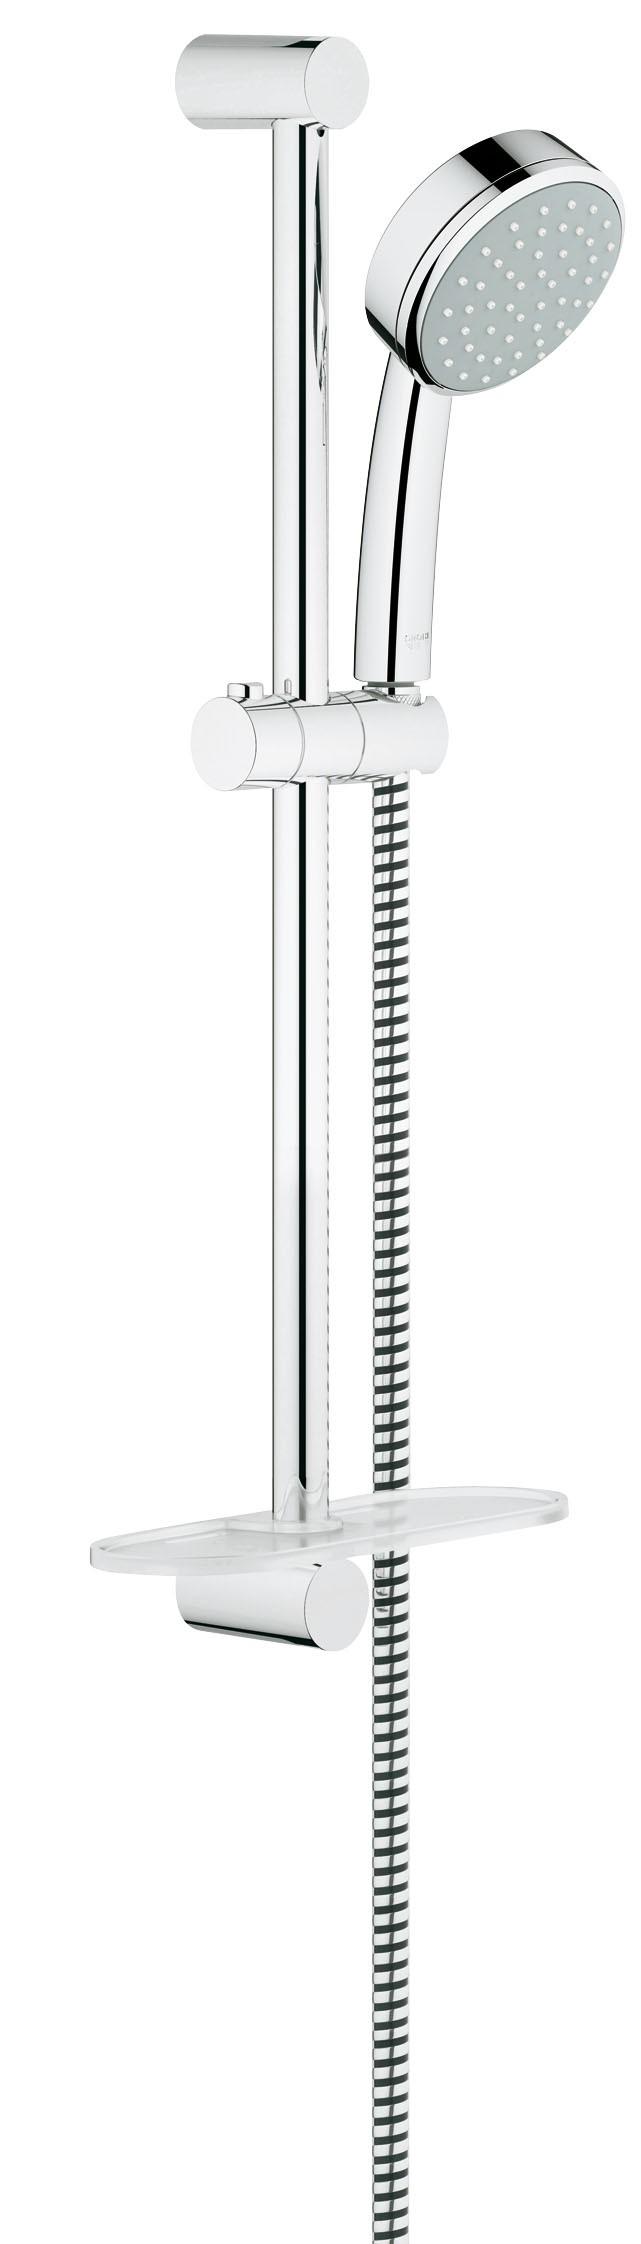 Grohe 26083001 Tempesta Cosmopolitan (ручной душ, штанга 600 мм, шланг 1750 мм), хром